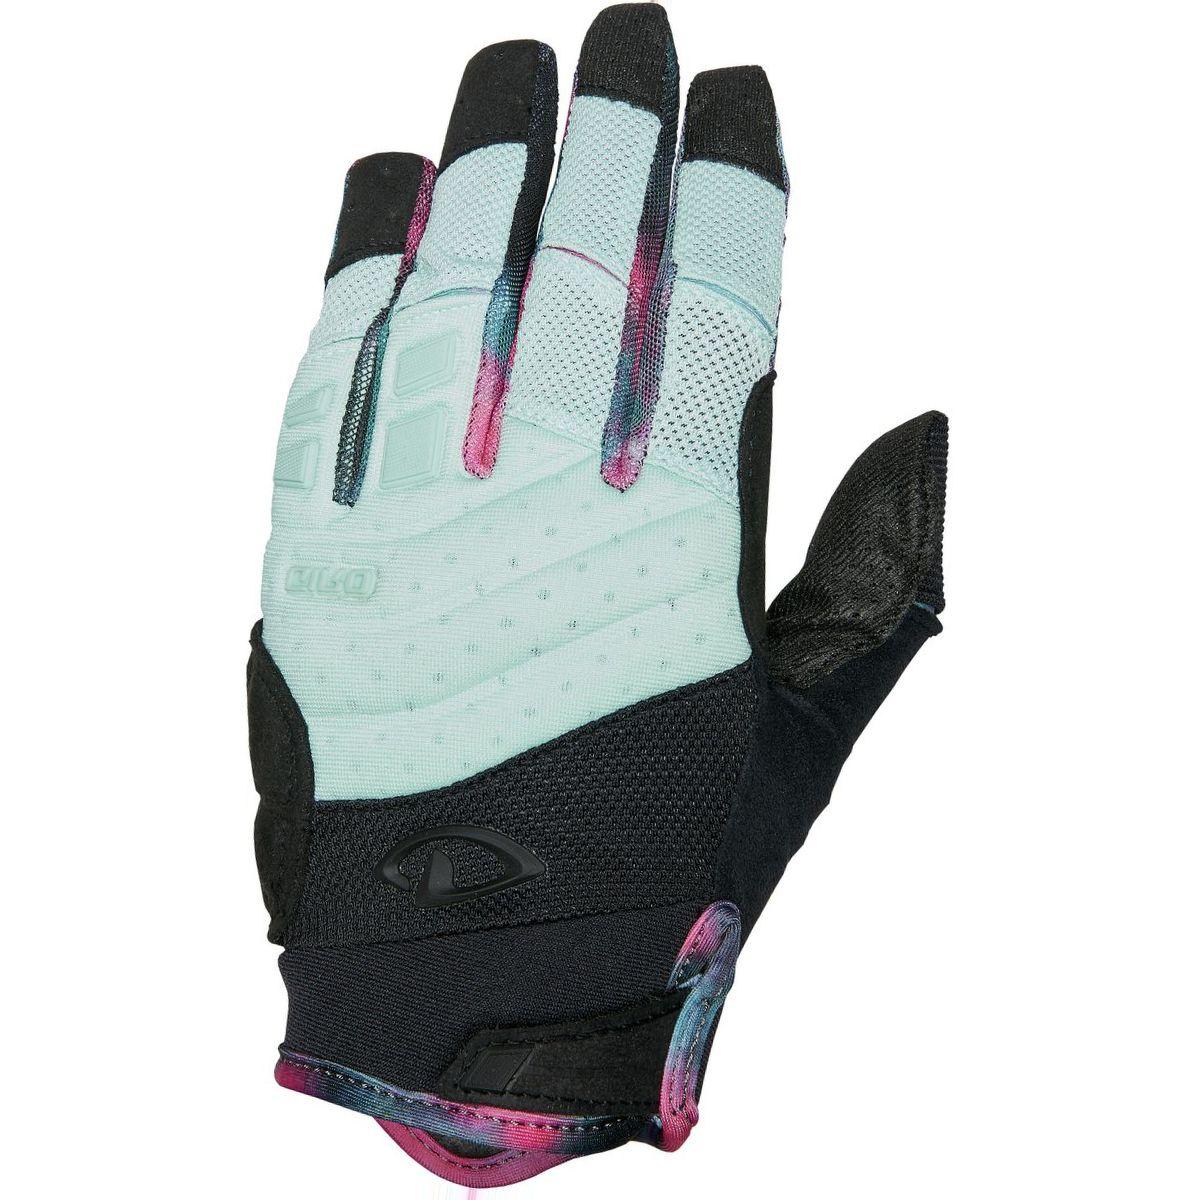 Giro Xena Gloves - Women's